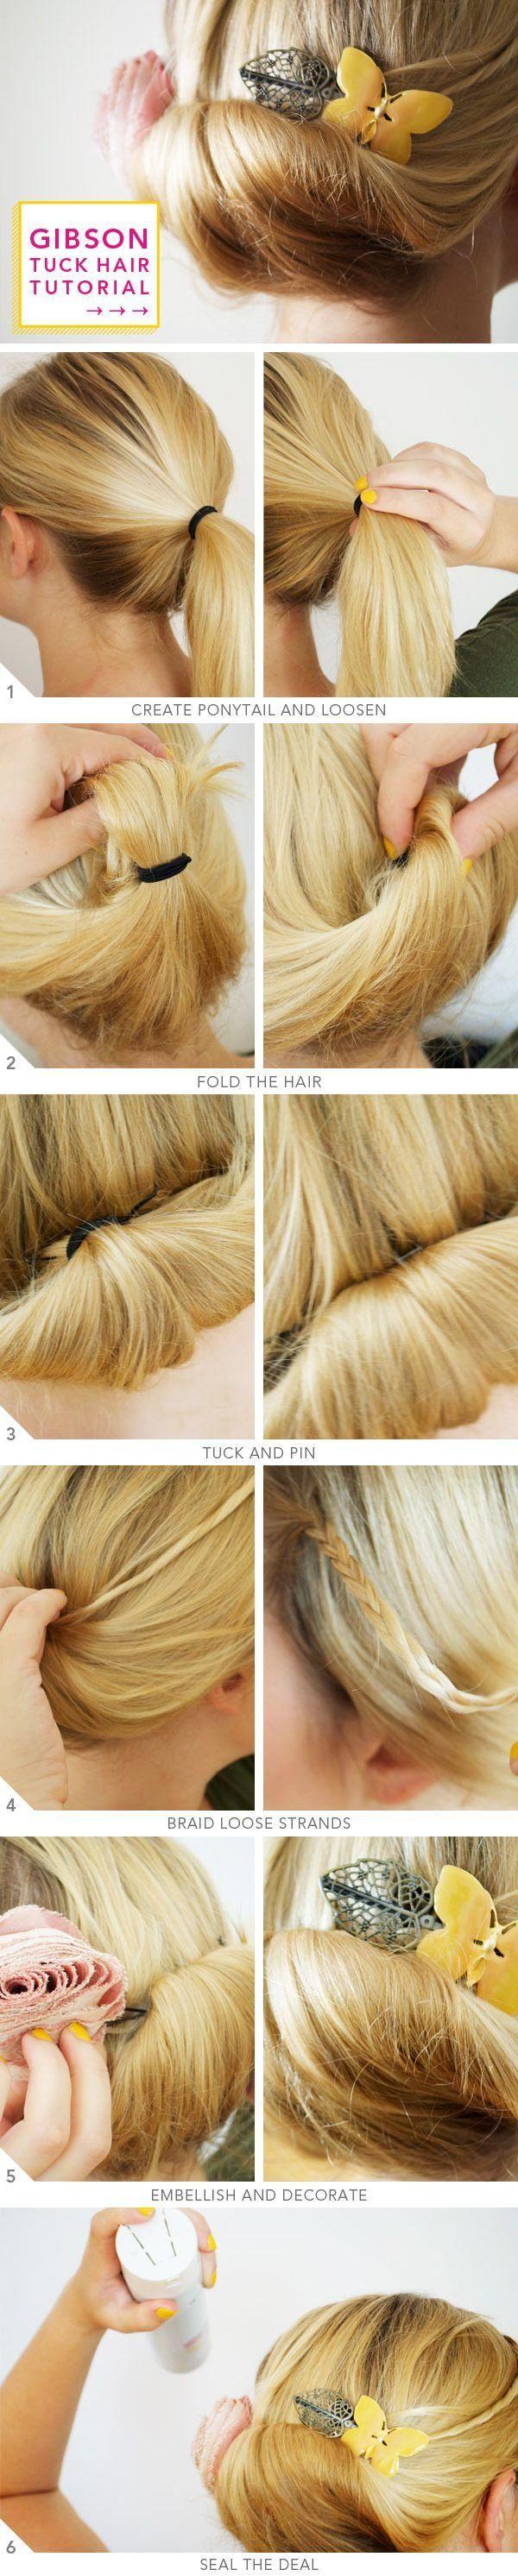 DIY Gibson Hair Tuck Tutorial